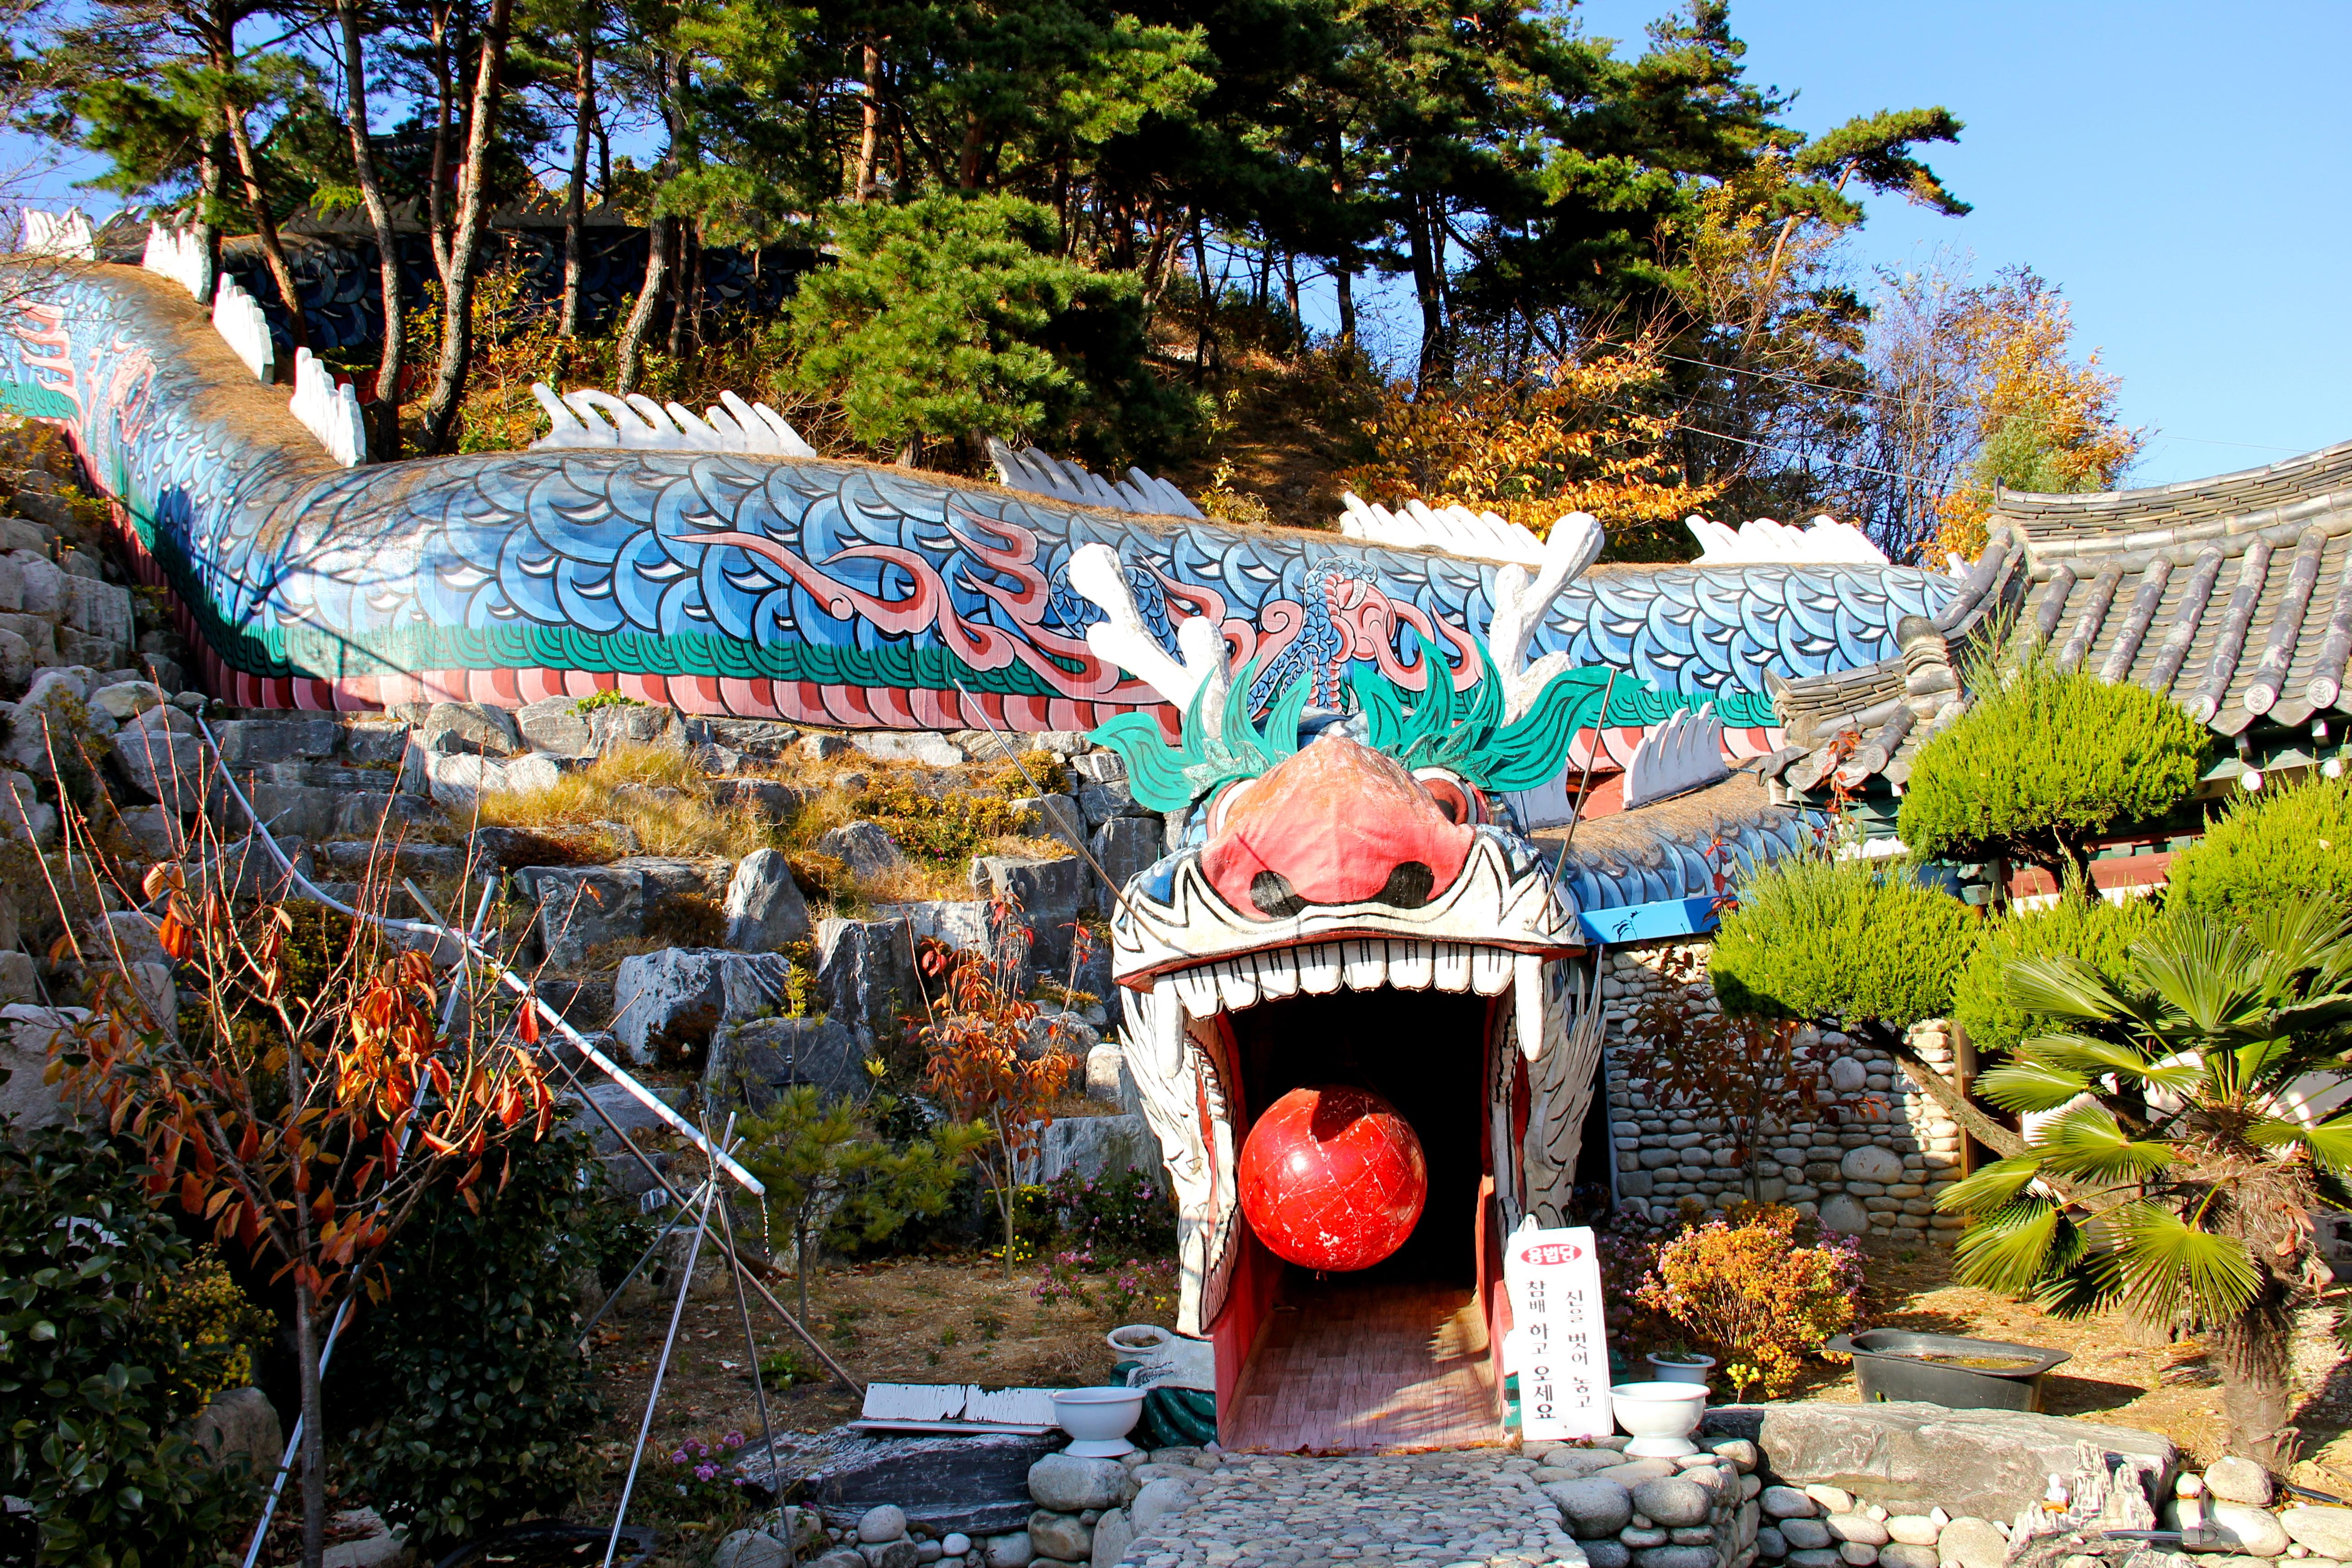 Korean Dragon: The Korean Dragon Temple